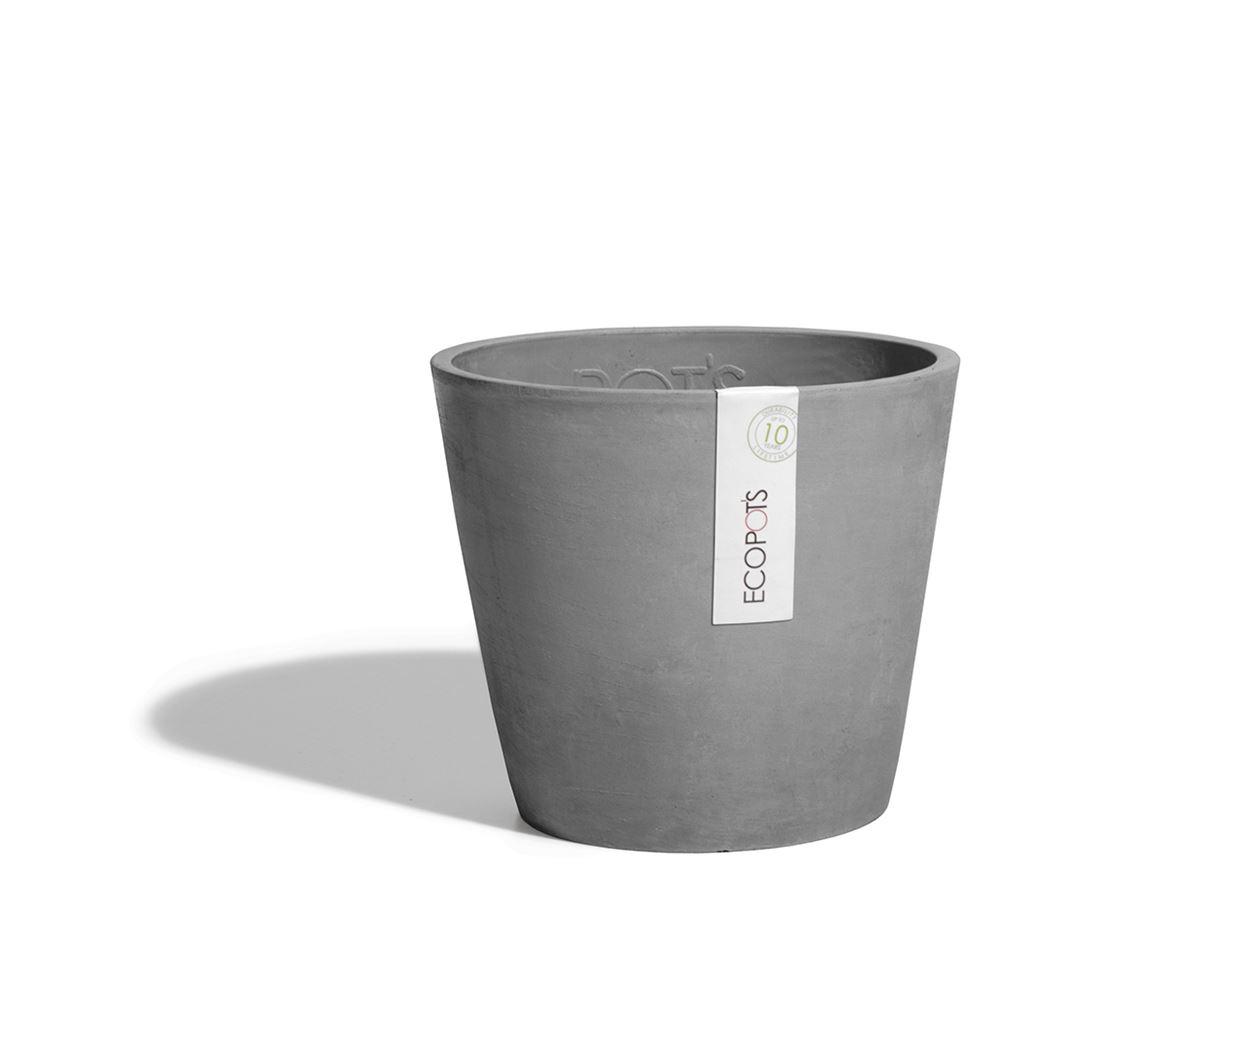 ecopot's amsterdam mini grey